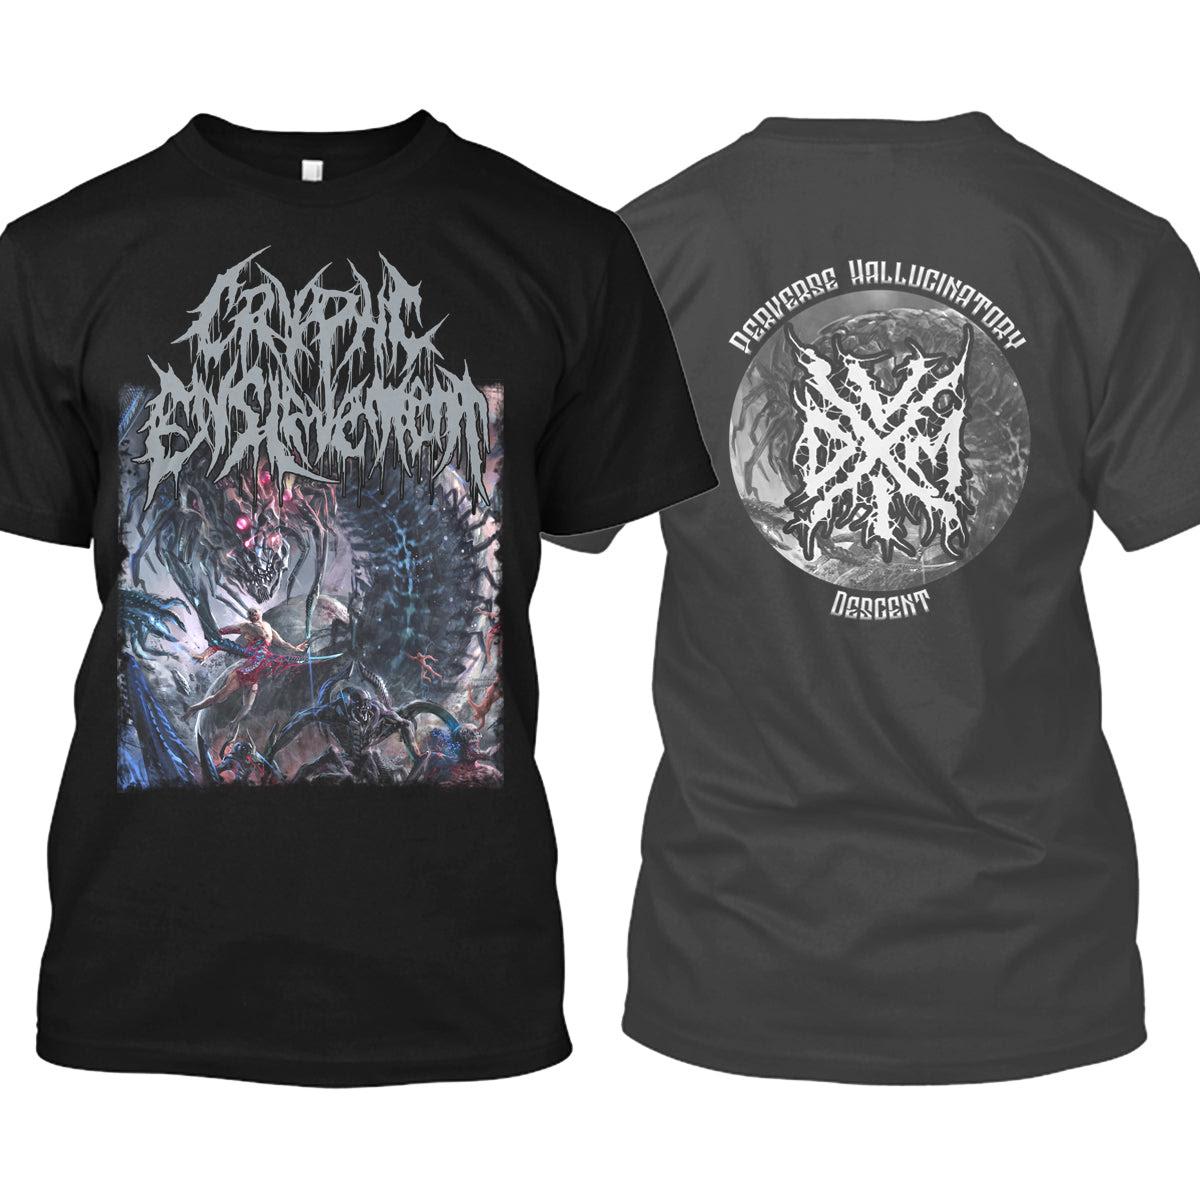 Cryptic Enslavement - Perverse Hallucinatory Descent (T-Shirt)